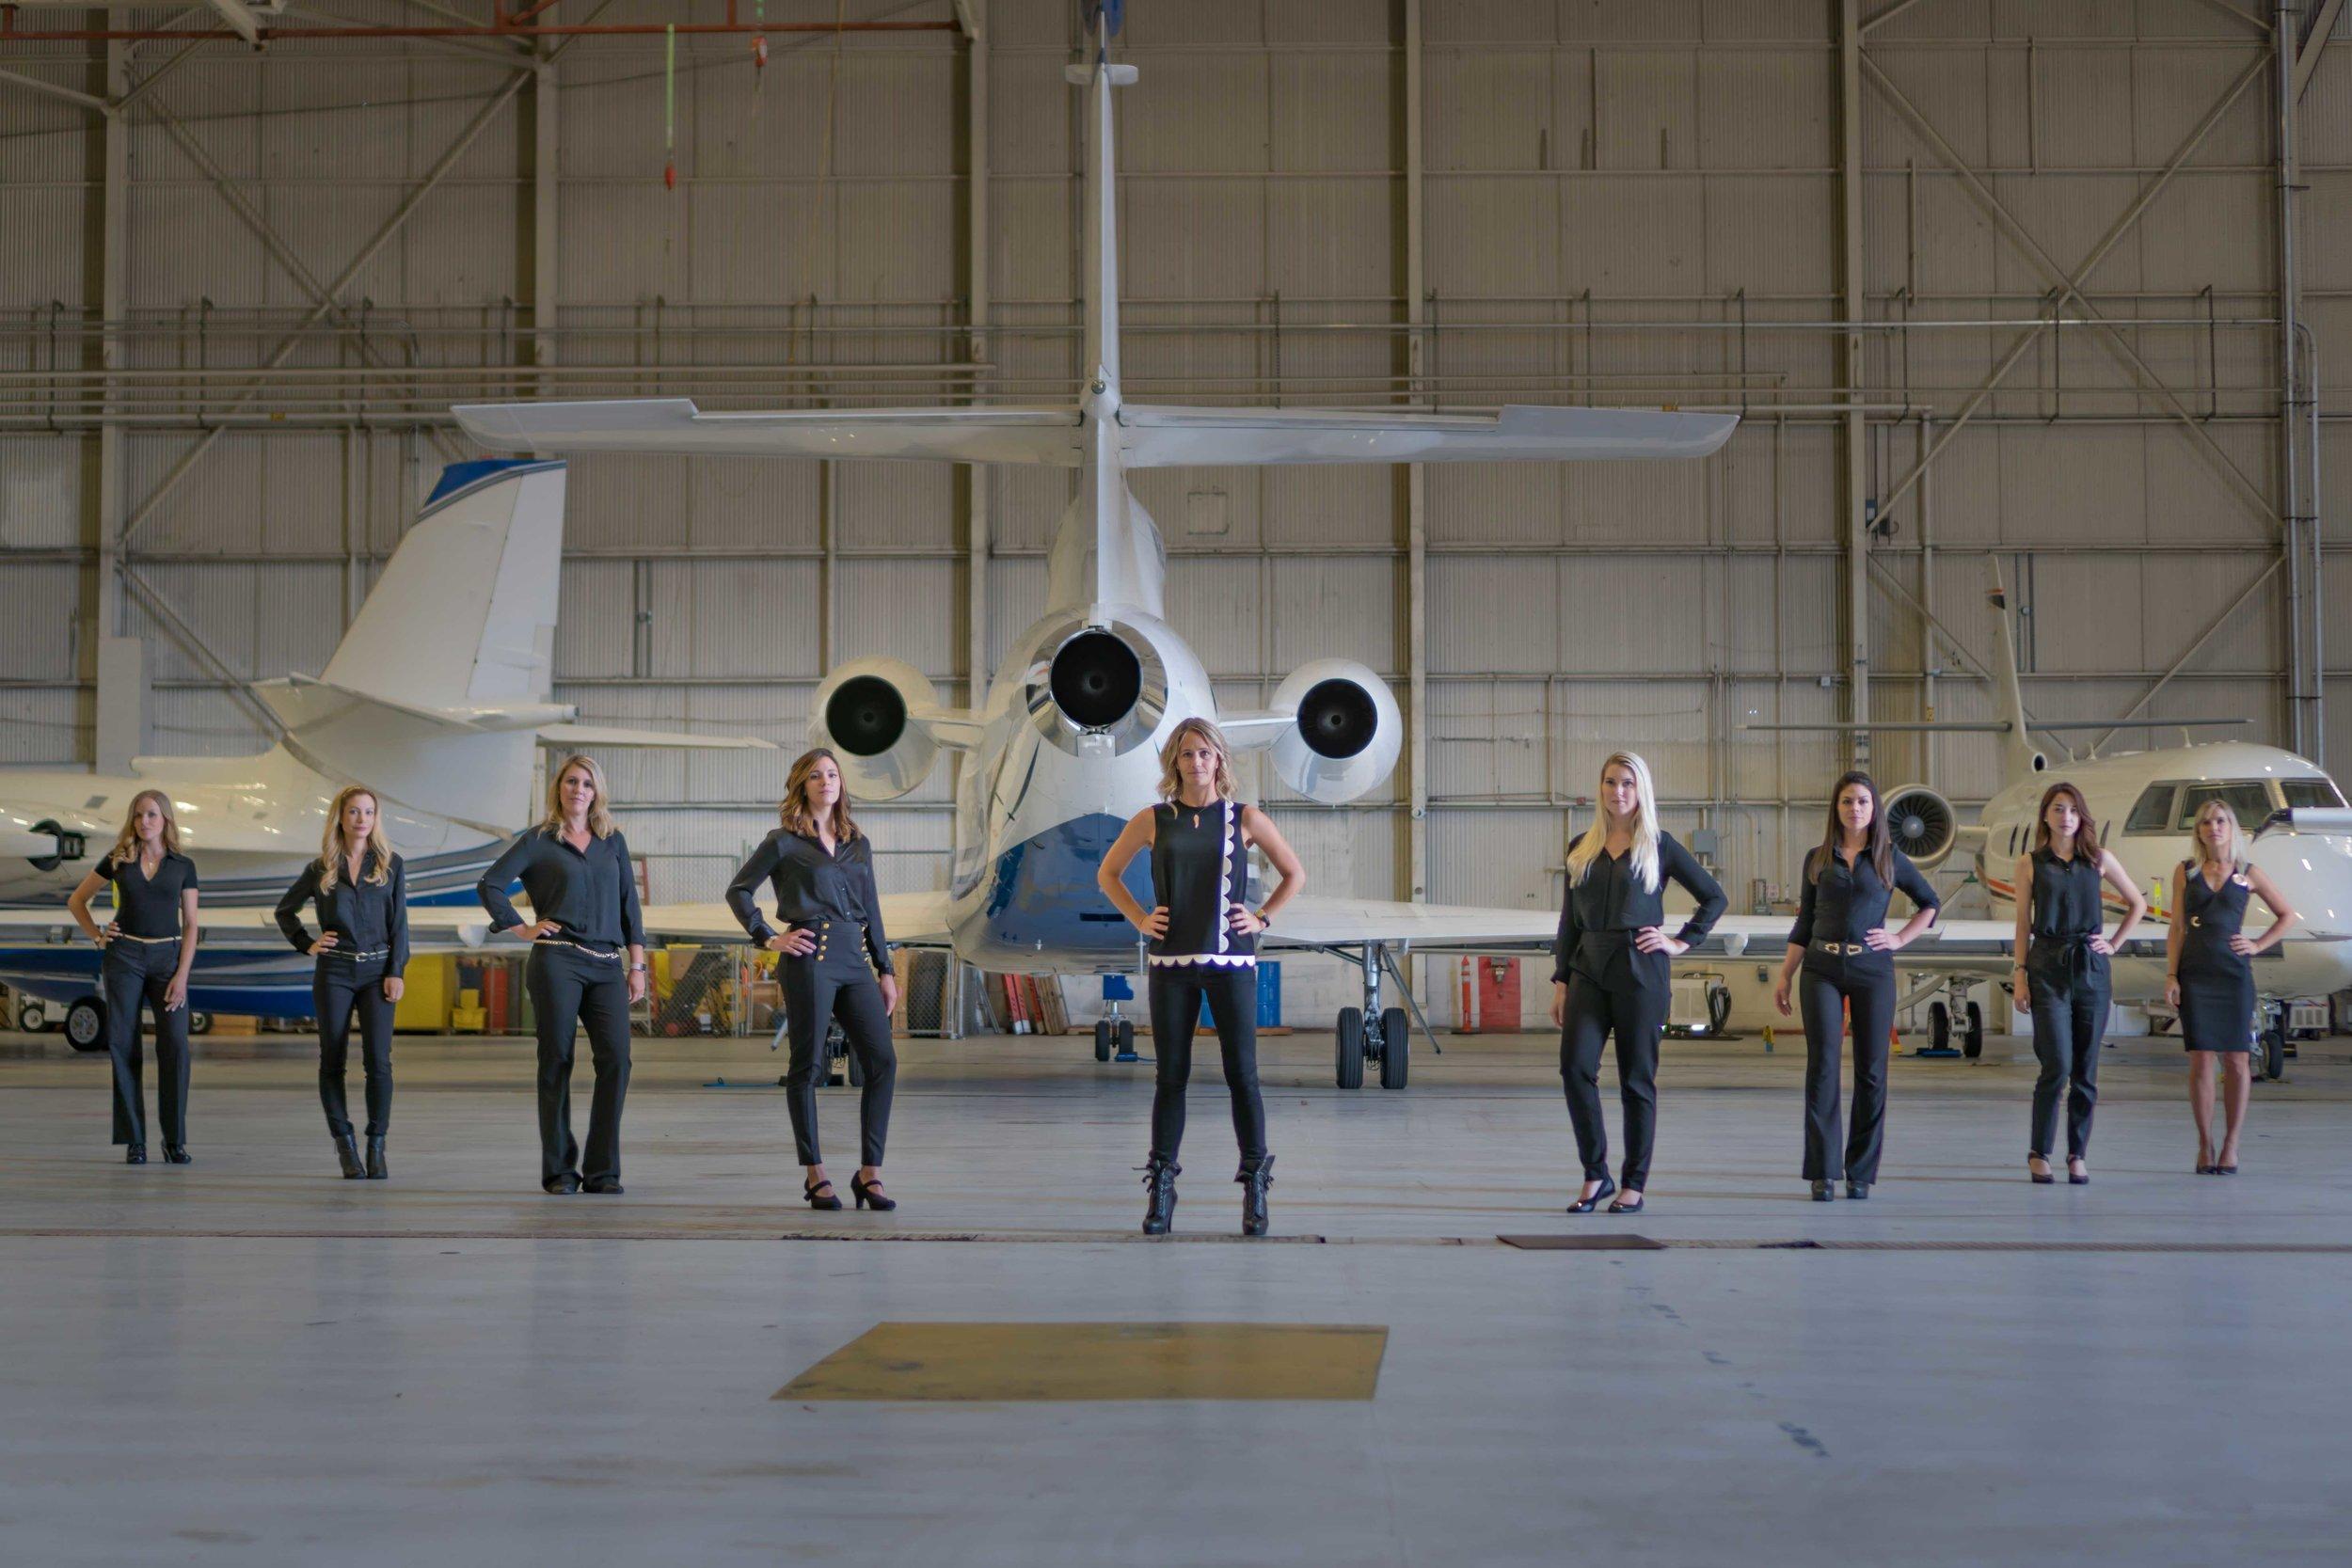 Find Flight Attendants and Pilots